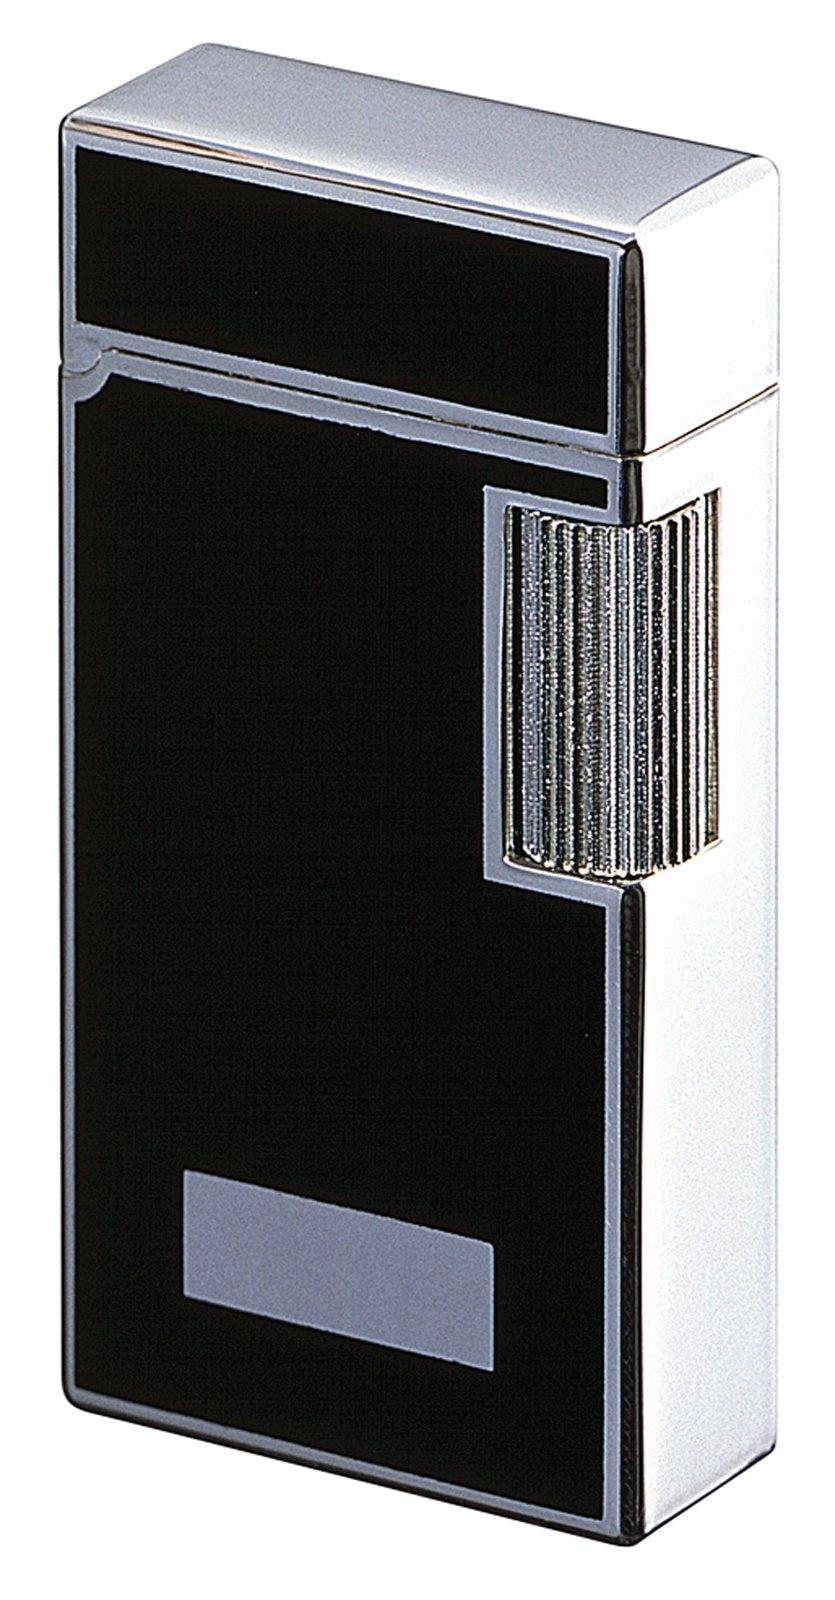 Sarome Flint Lighter SD1-37 Silver 2-side black lacquer